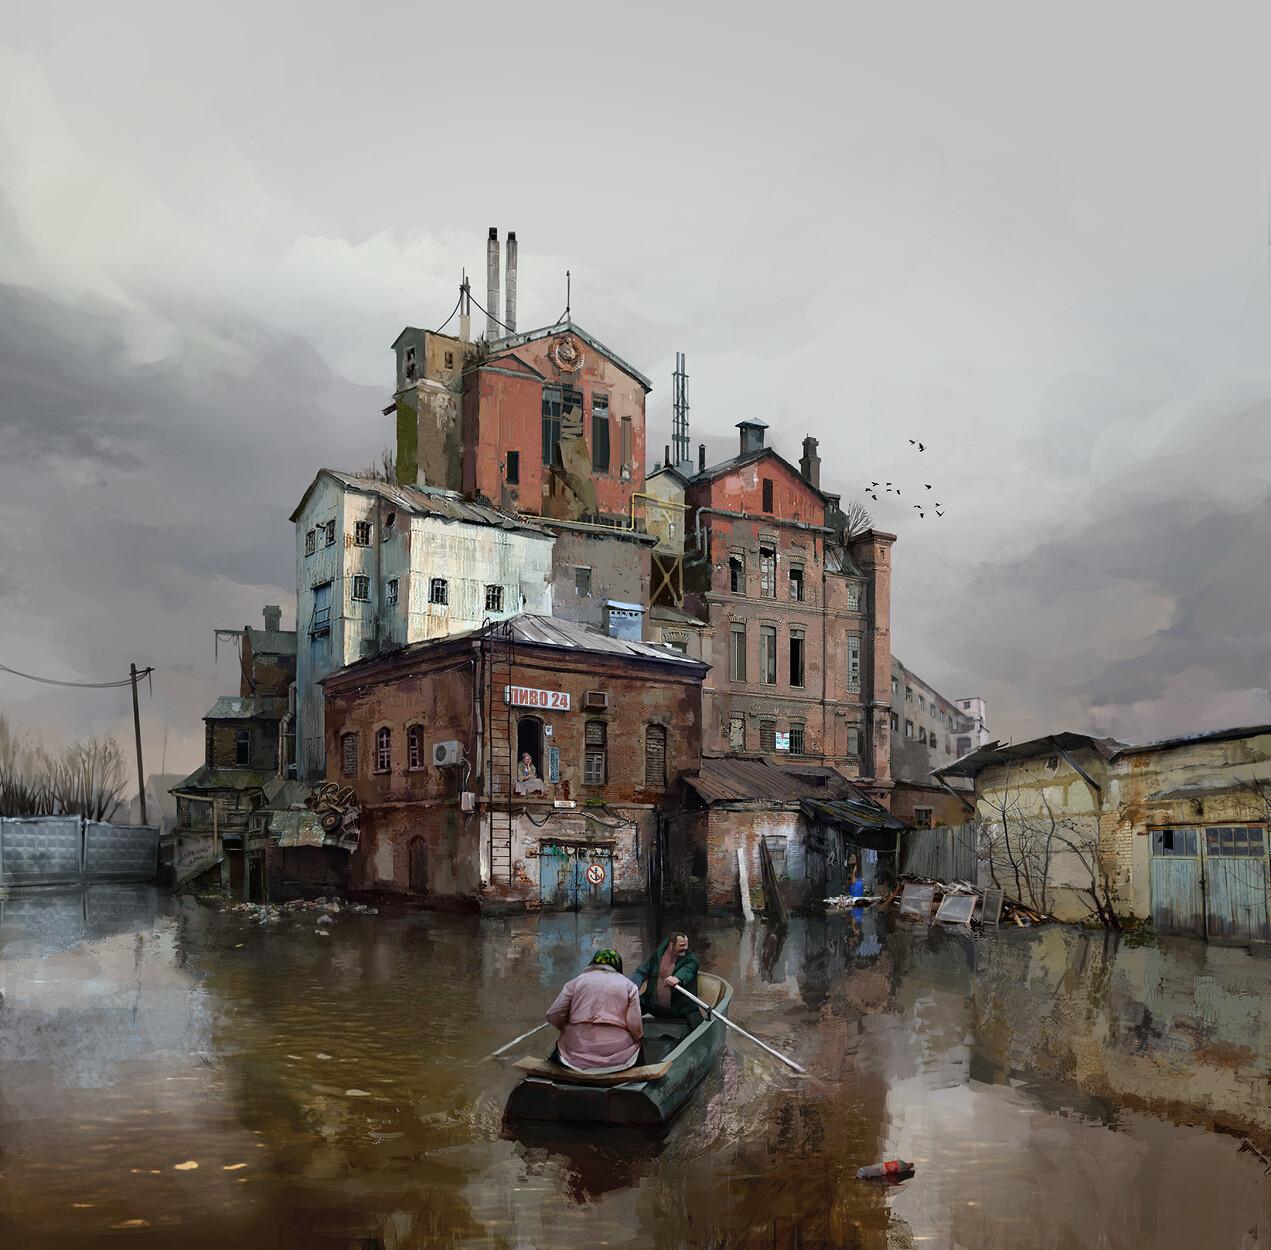 vladimir-malakhovskiy-spring-is-coming-1250.jpg